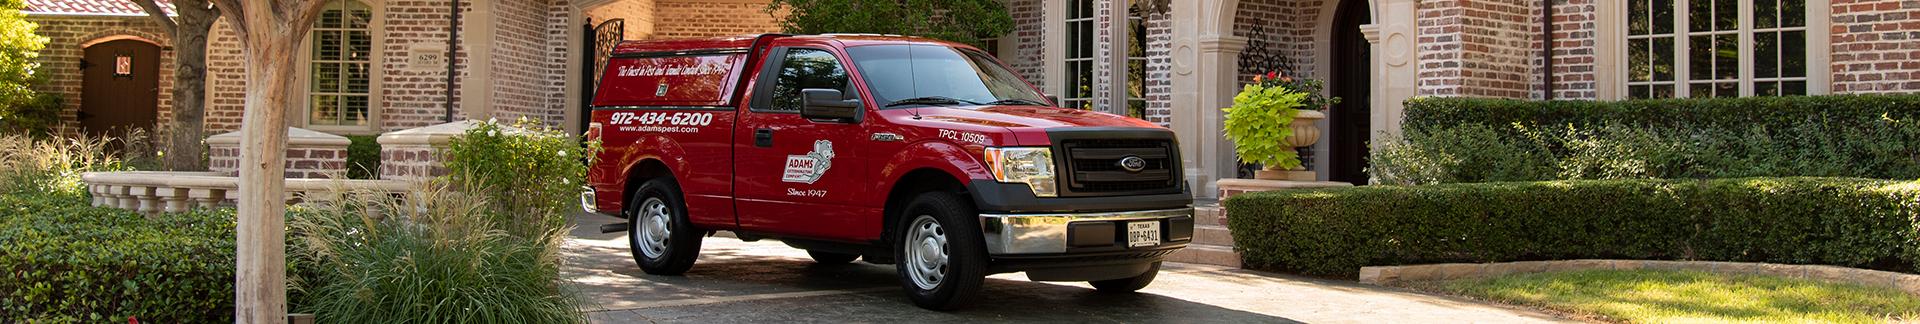 adams pest control's truck in addison texas